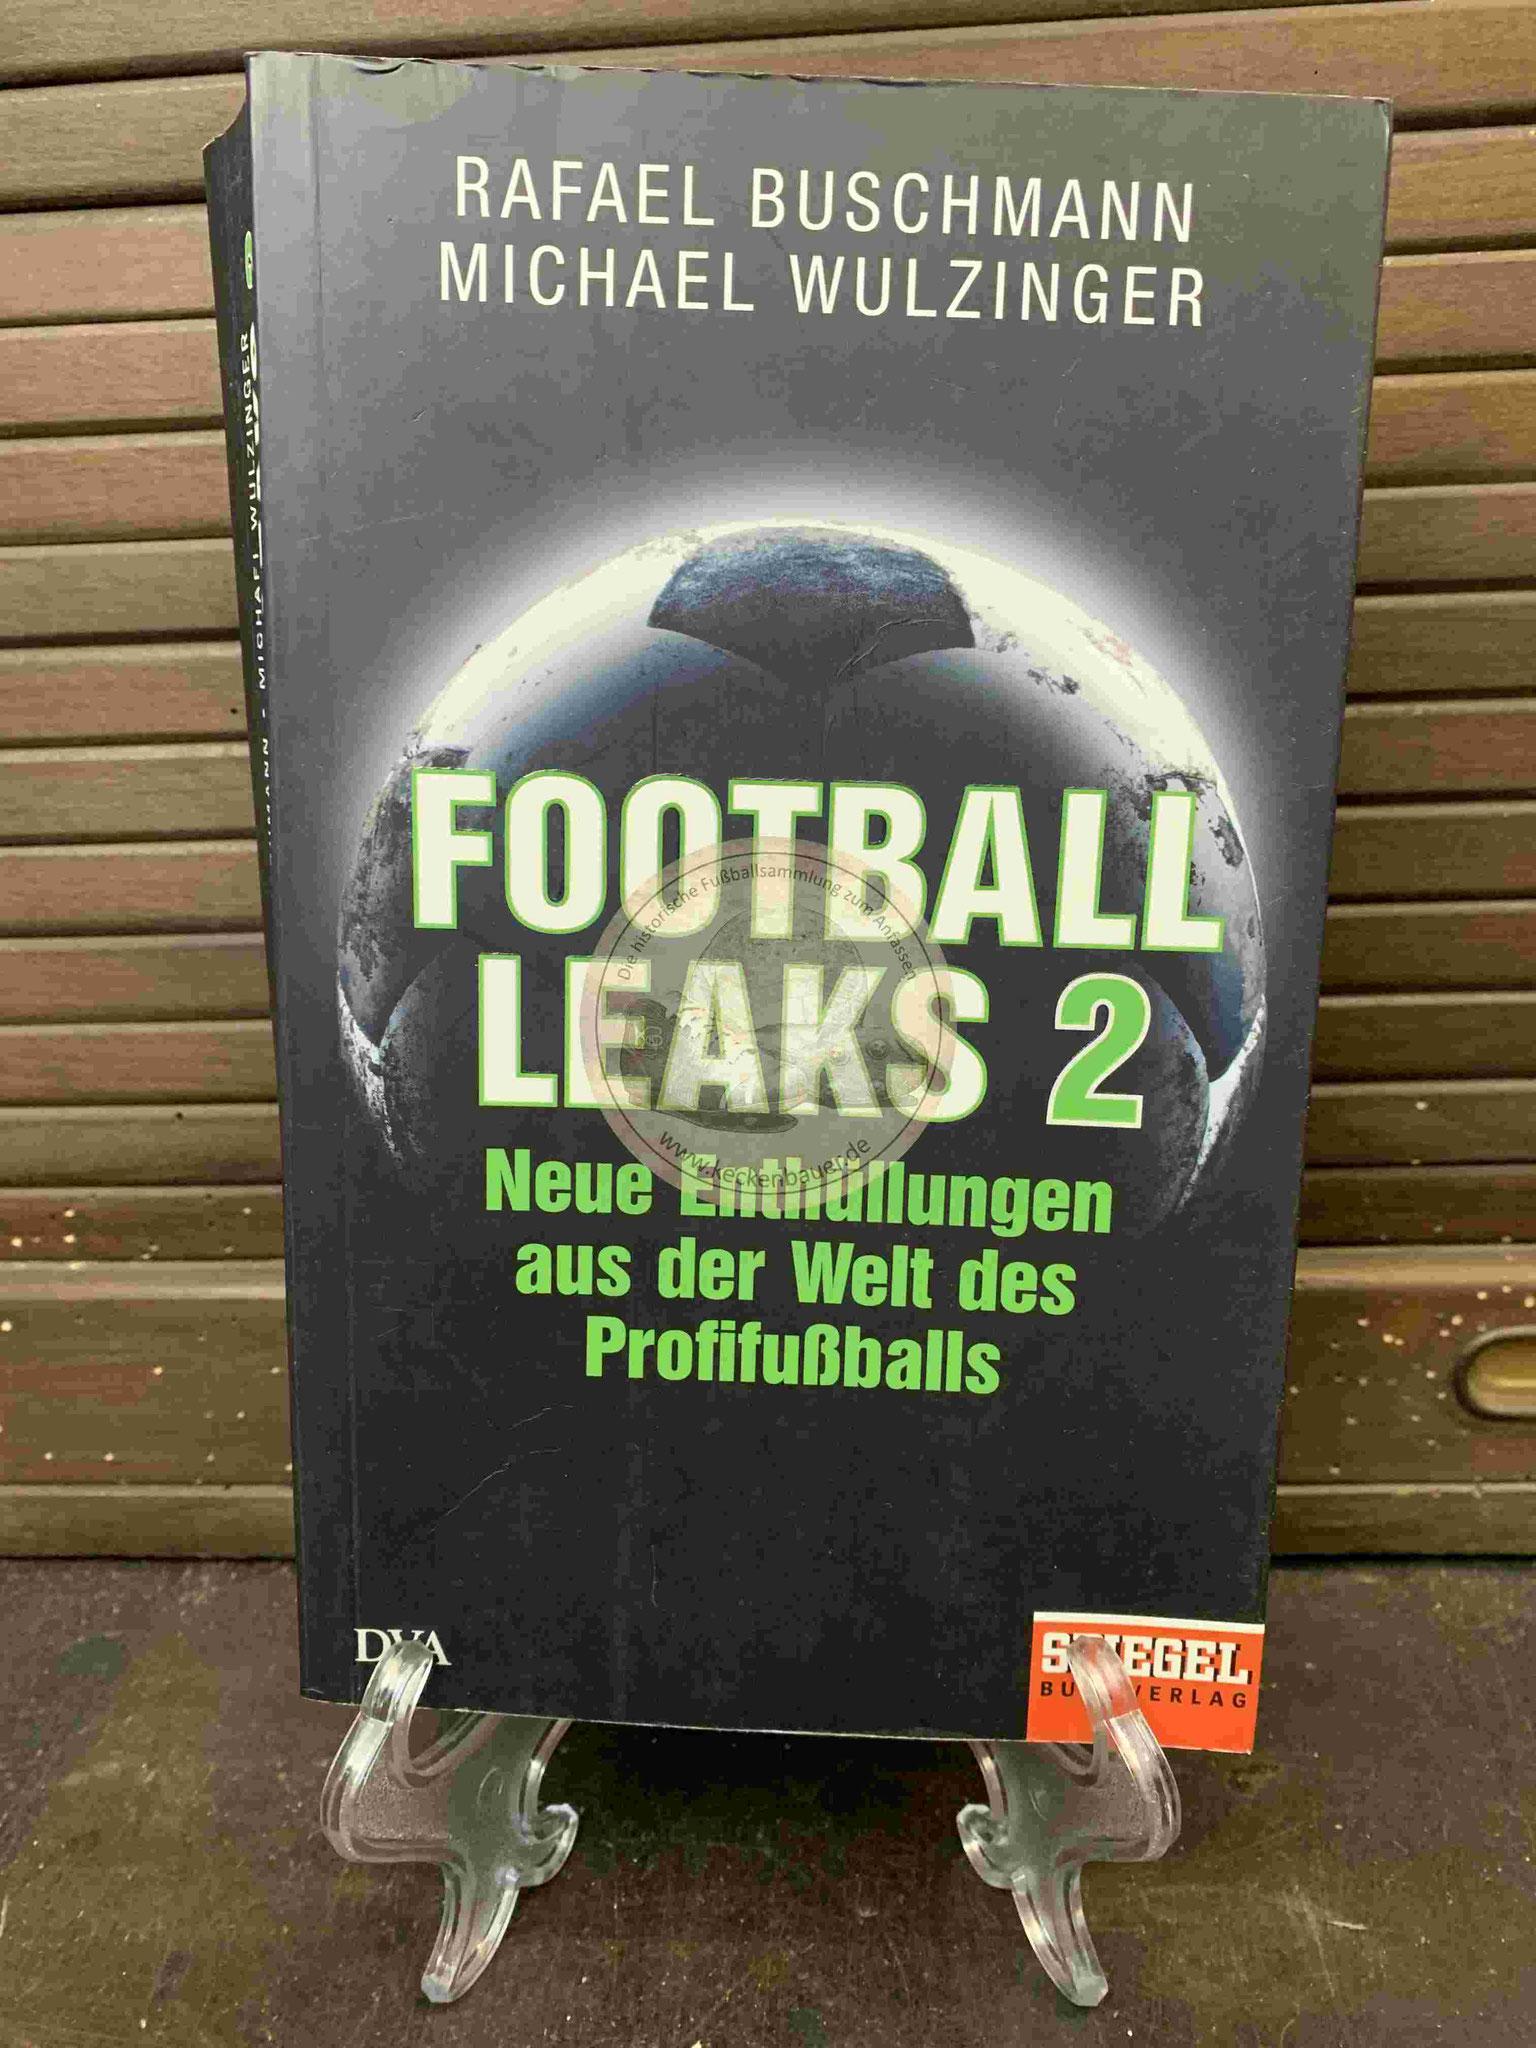 Rafael Buschmann Michael Wulzinger Football Leaks 2 aus dem Jahr 2019